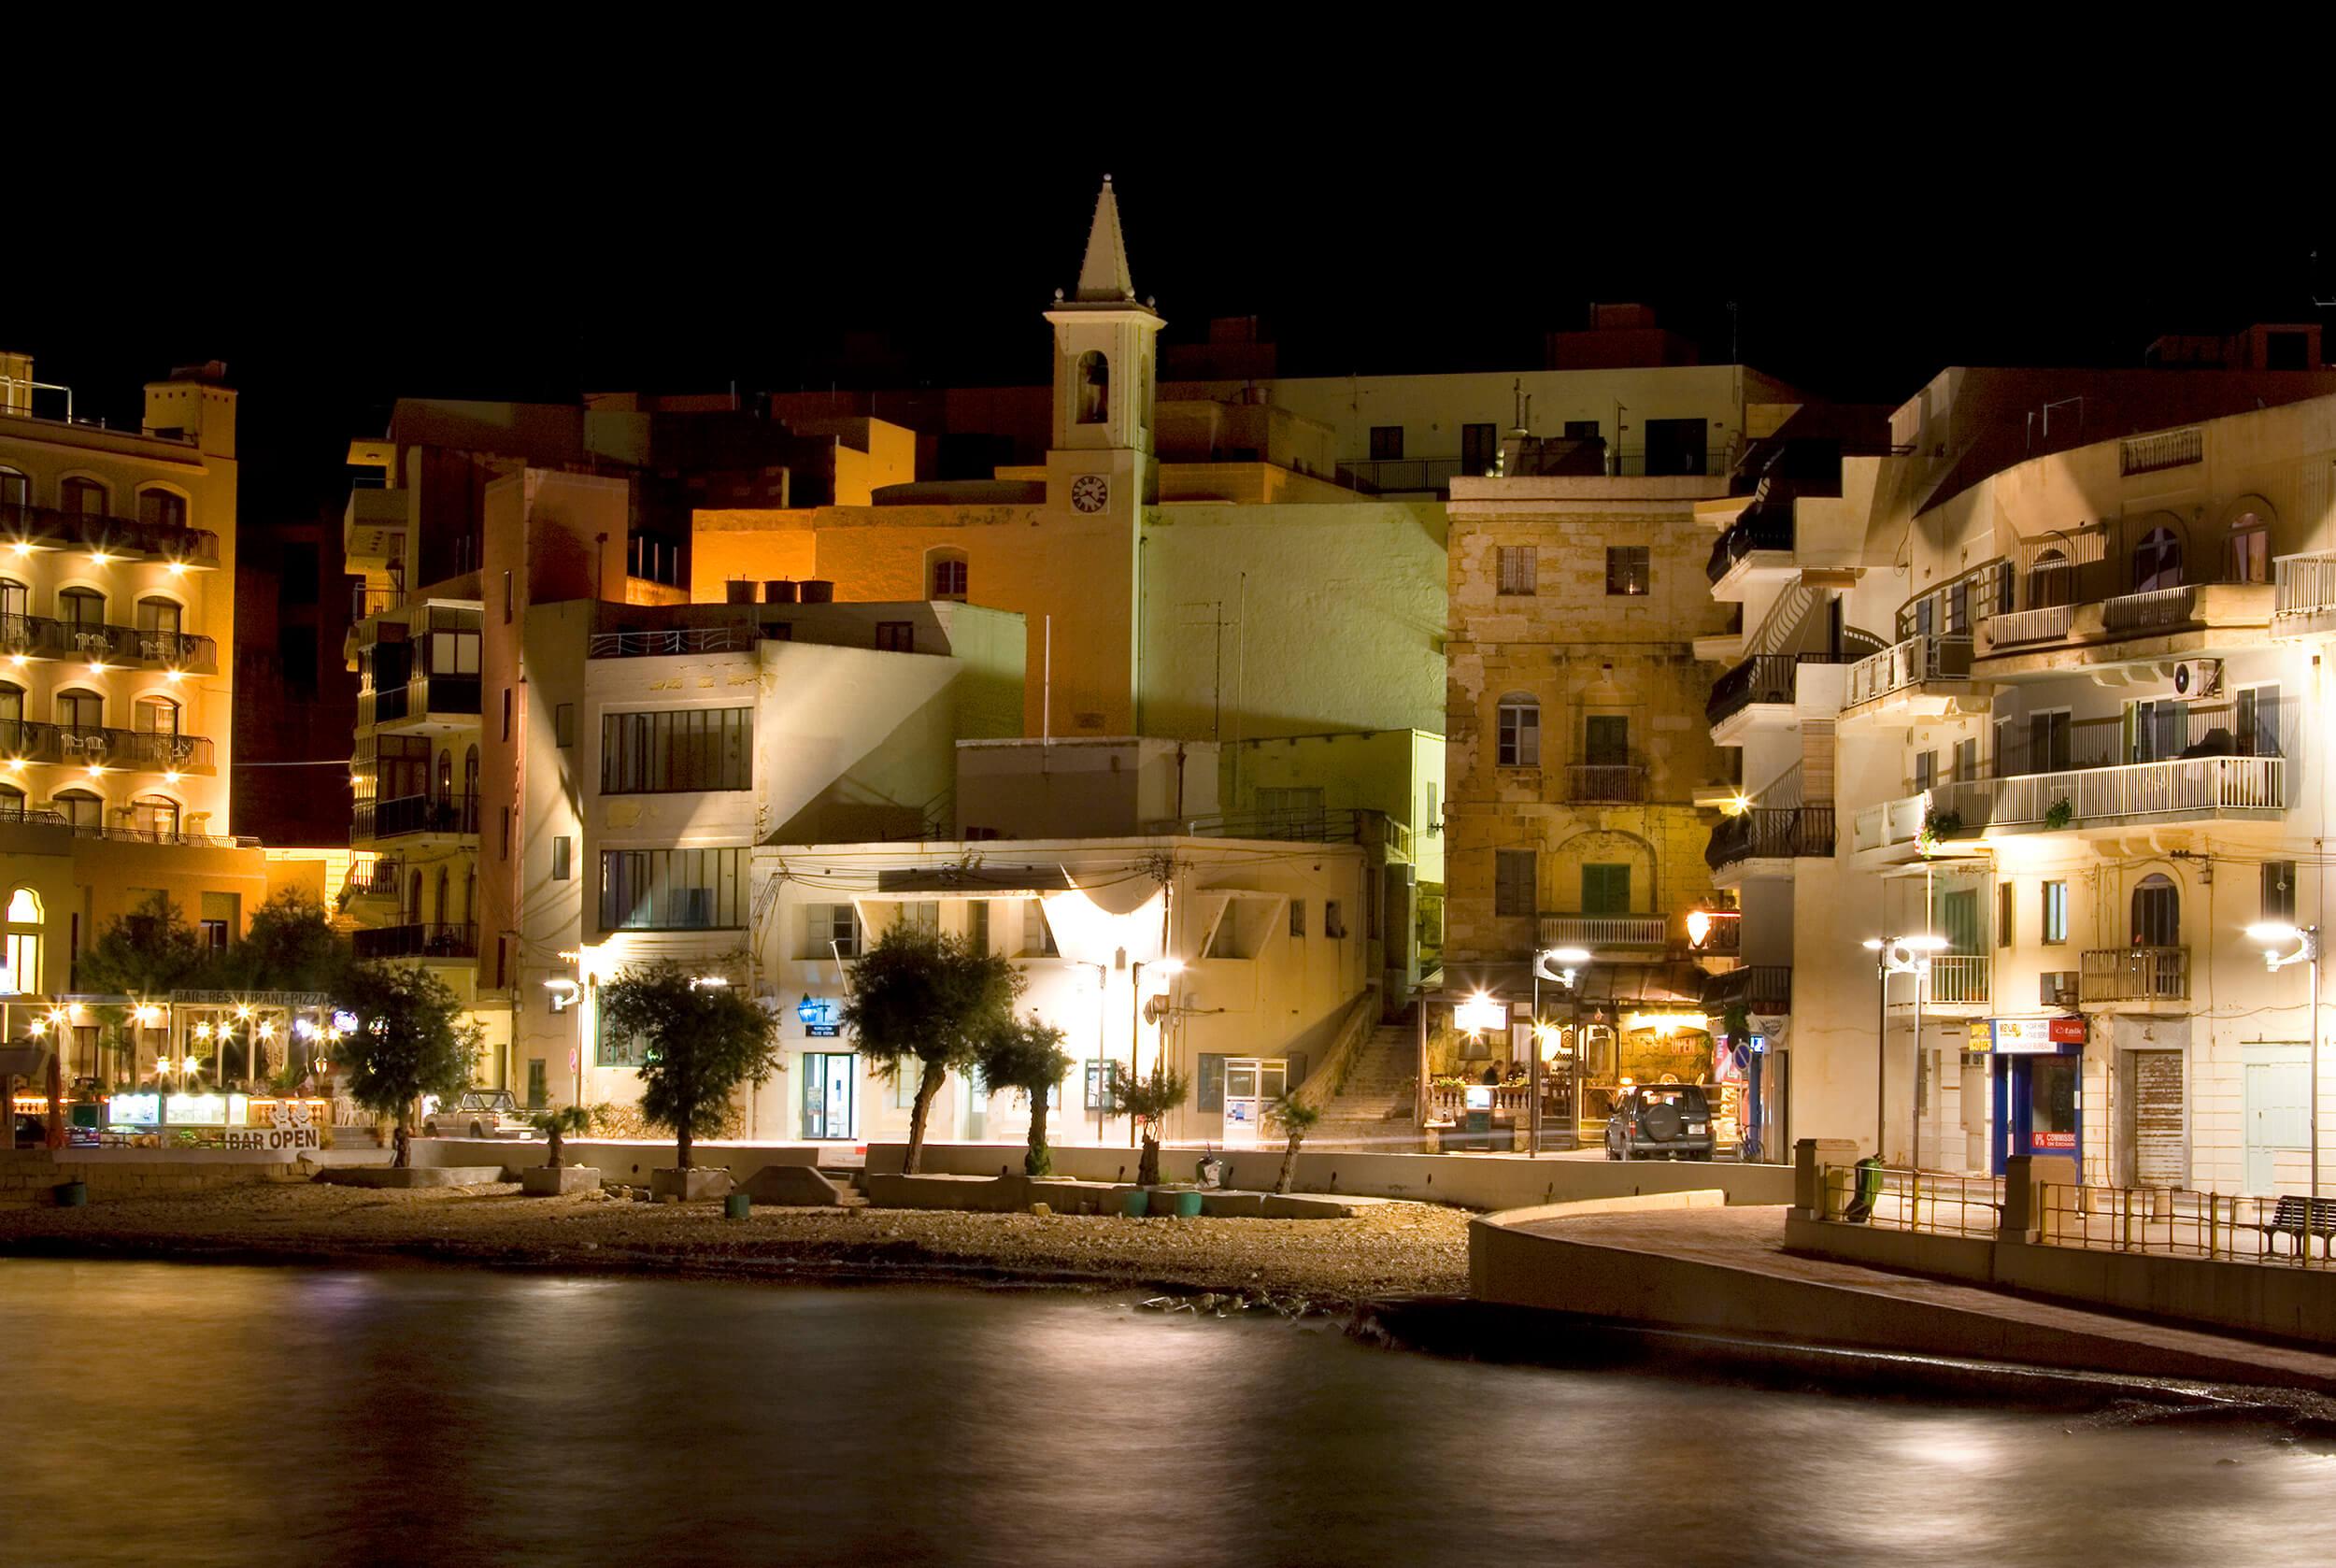 Iż-Żebbuġ-gozo